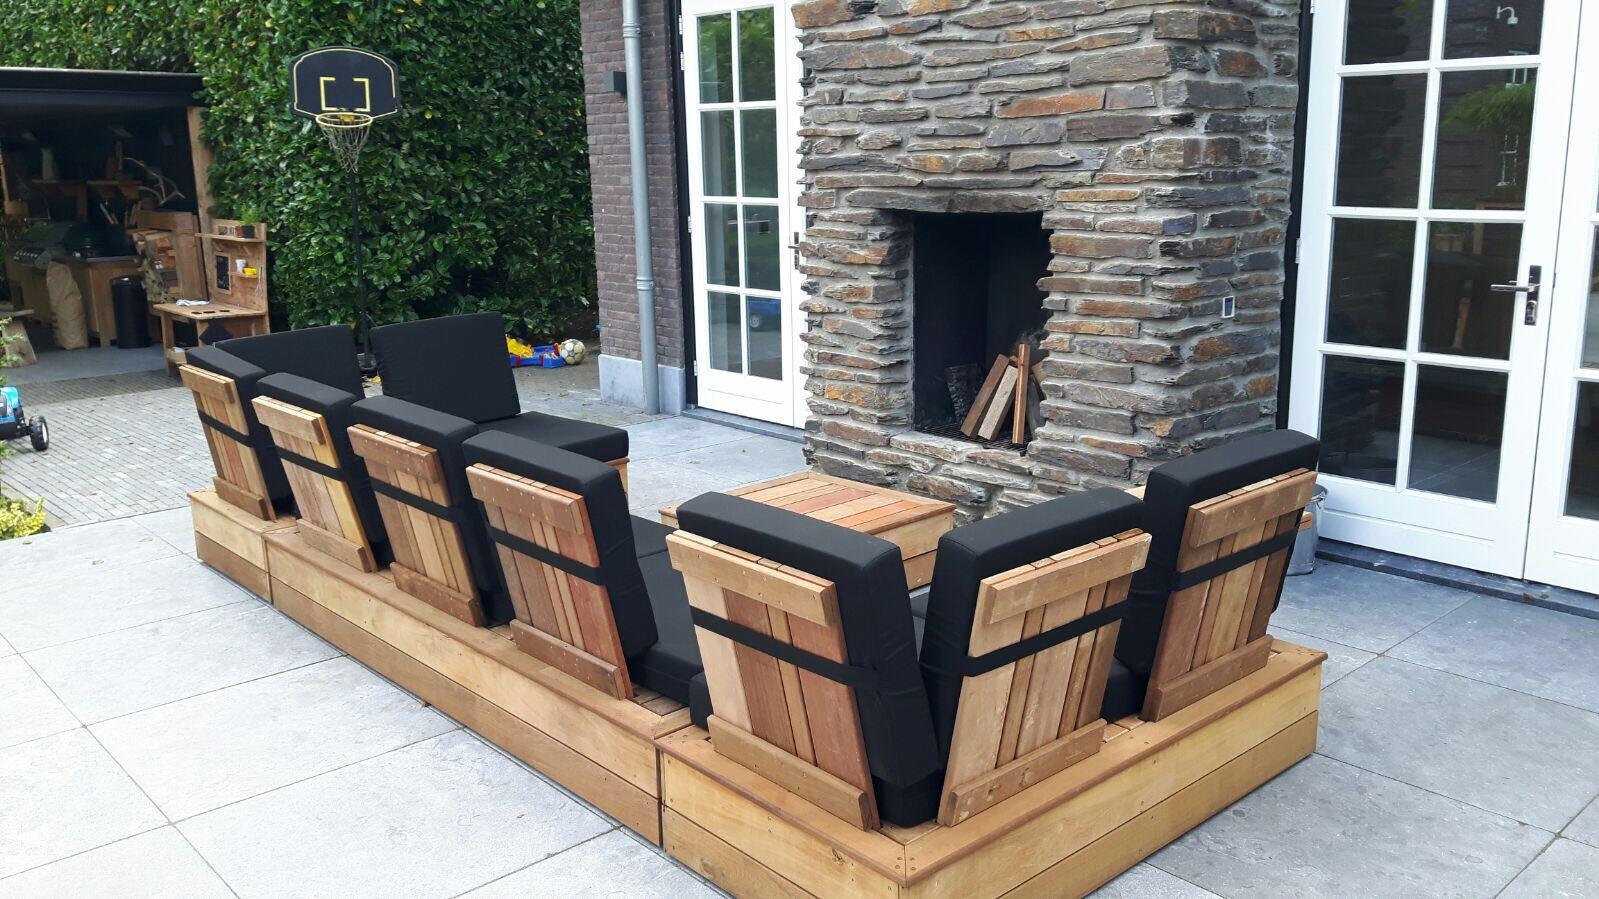 Tuinbank van Upcycled Wood